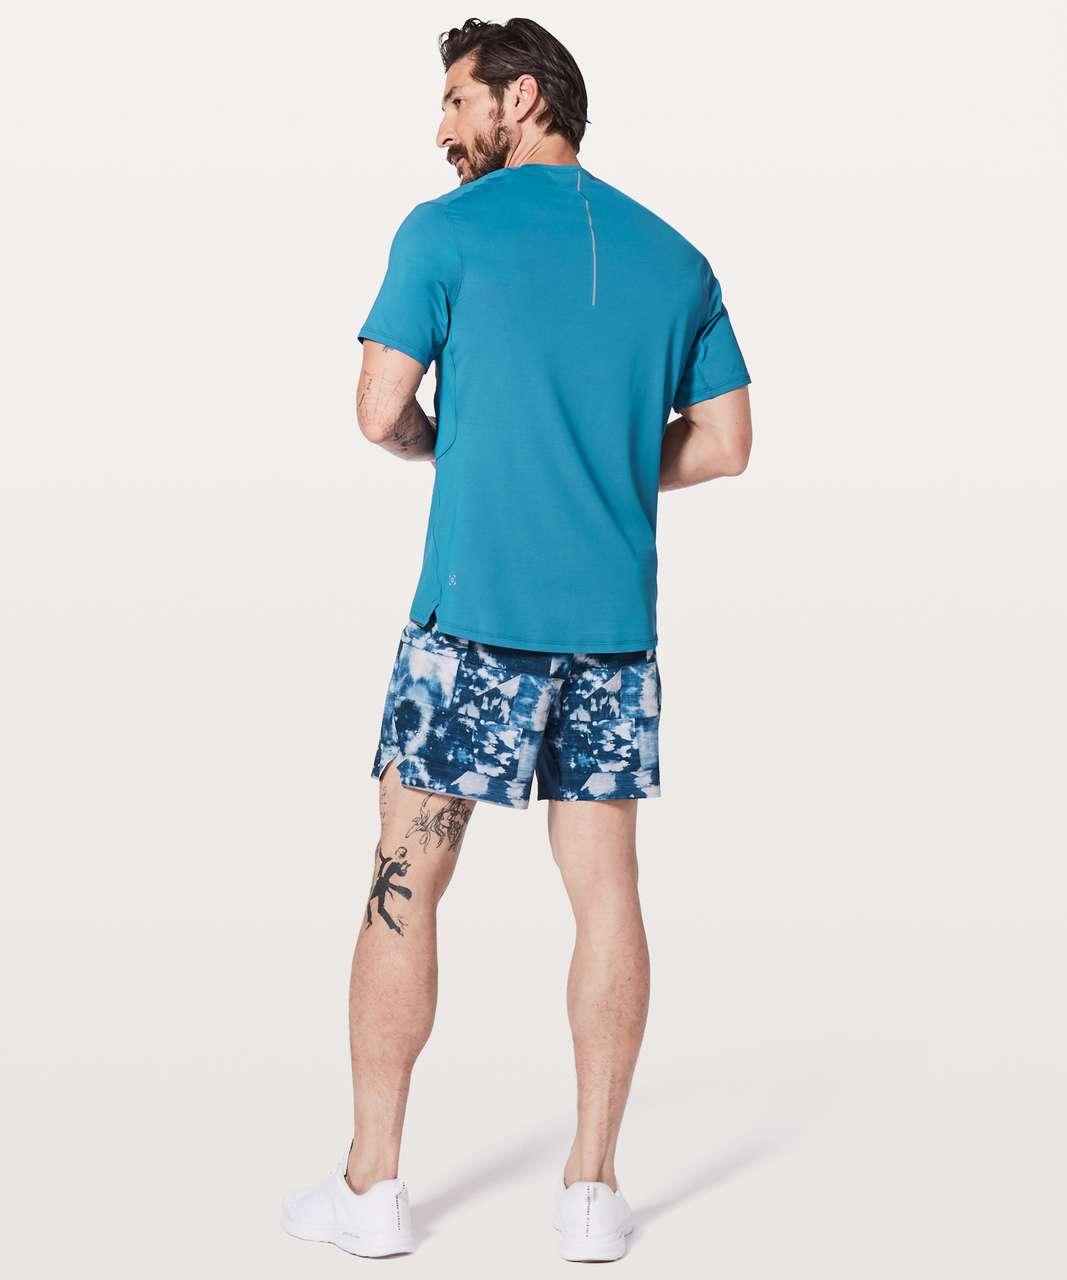 Lululemon Run Out Short Sleeve - Pewter Blue